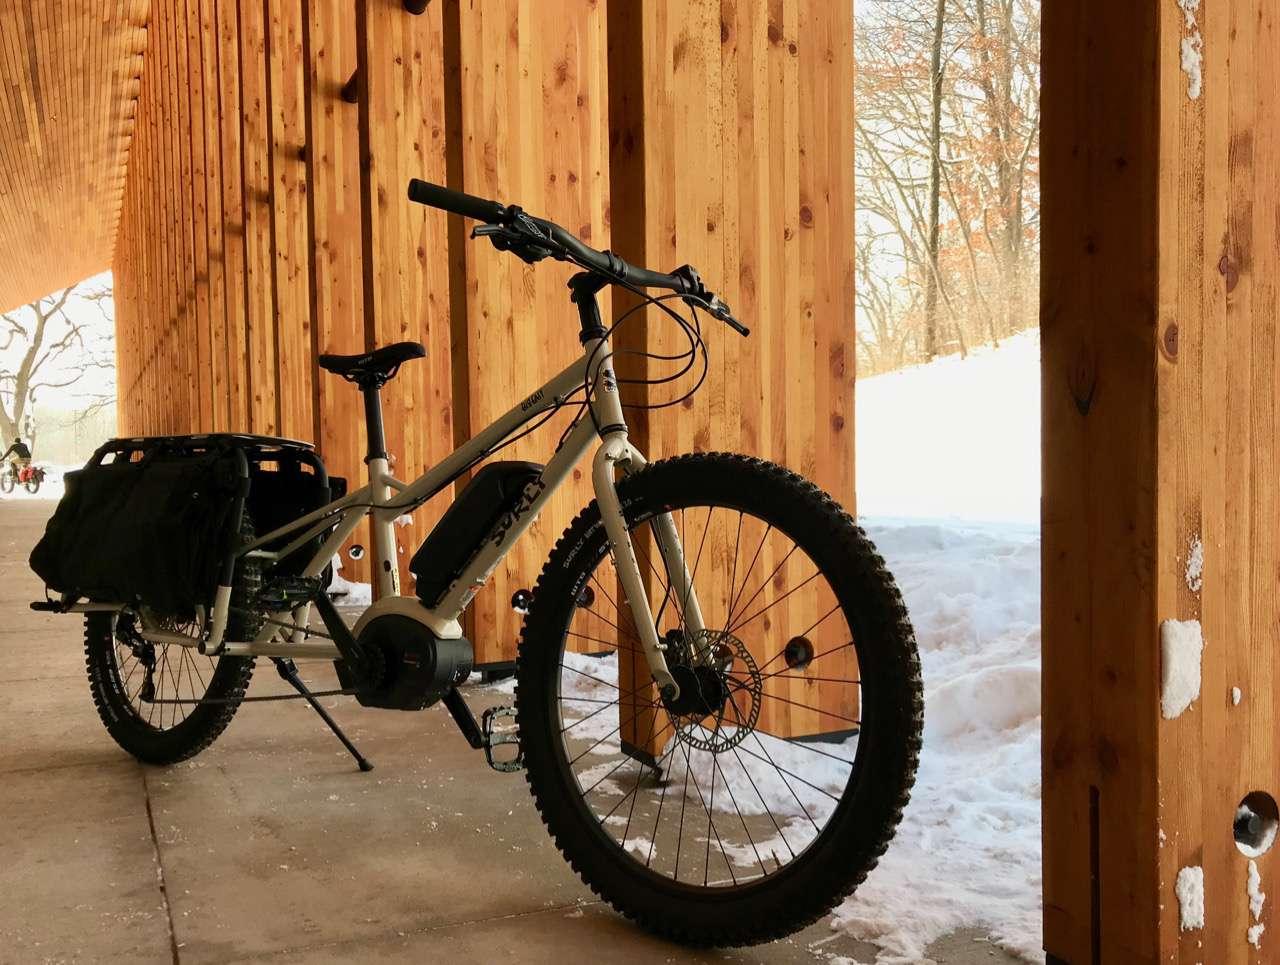 Surly big easy bike